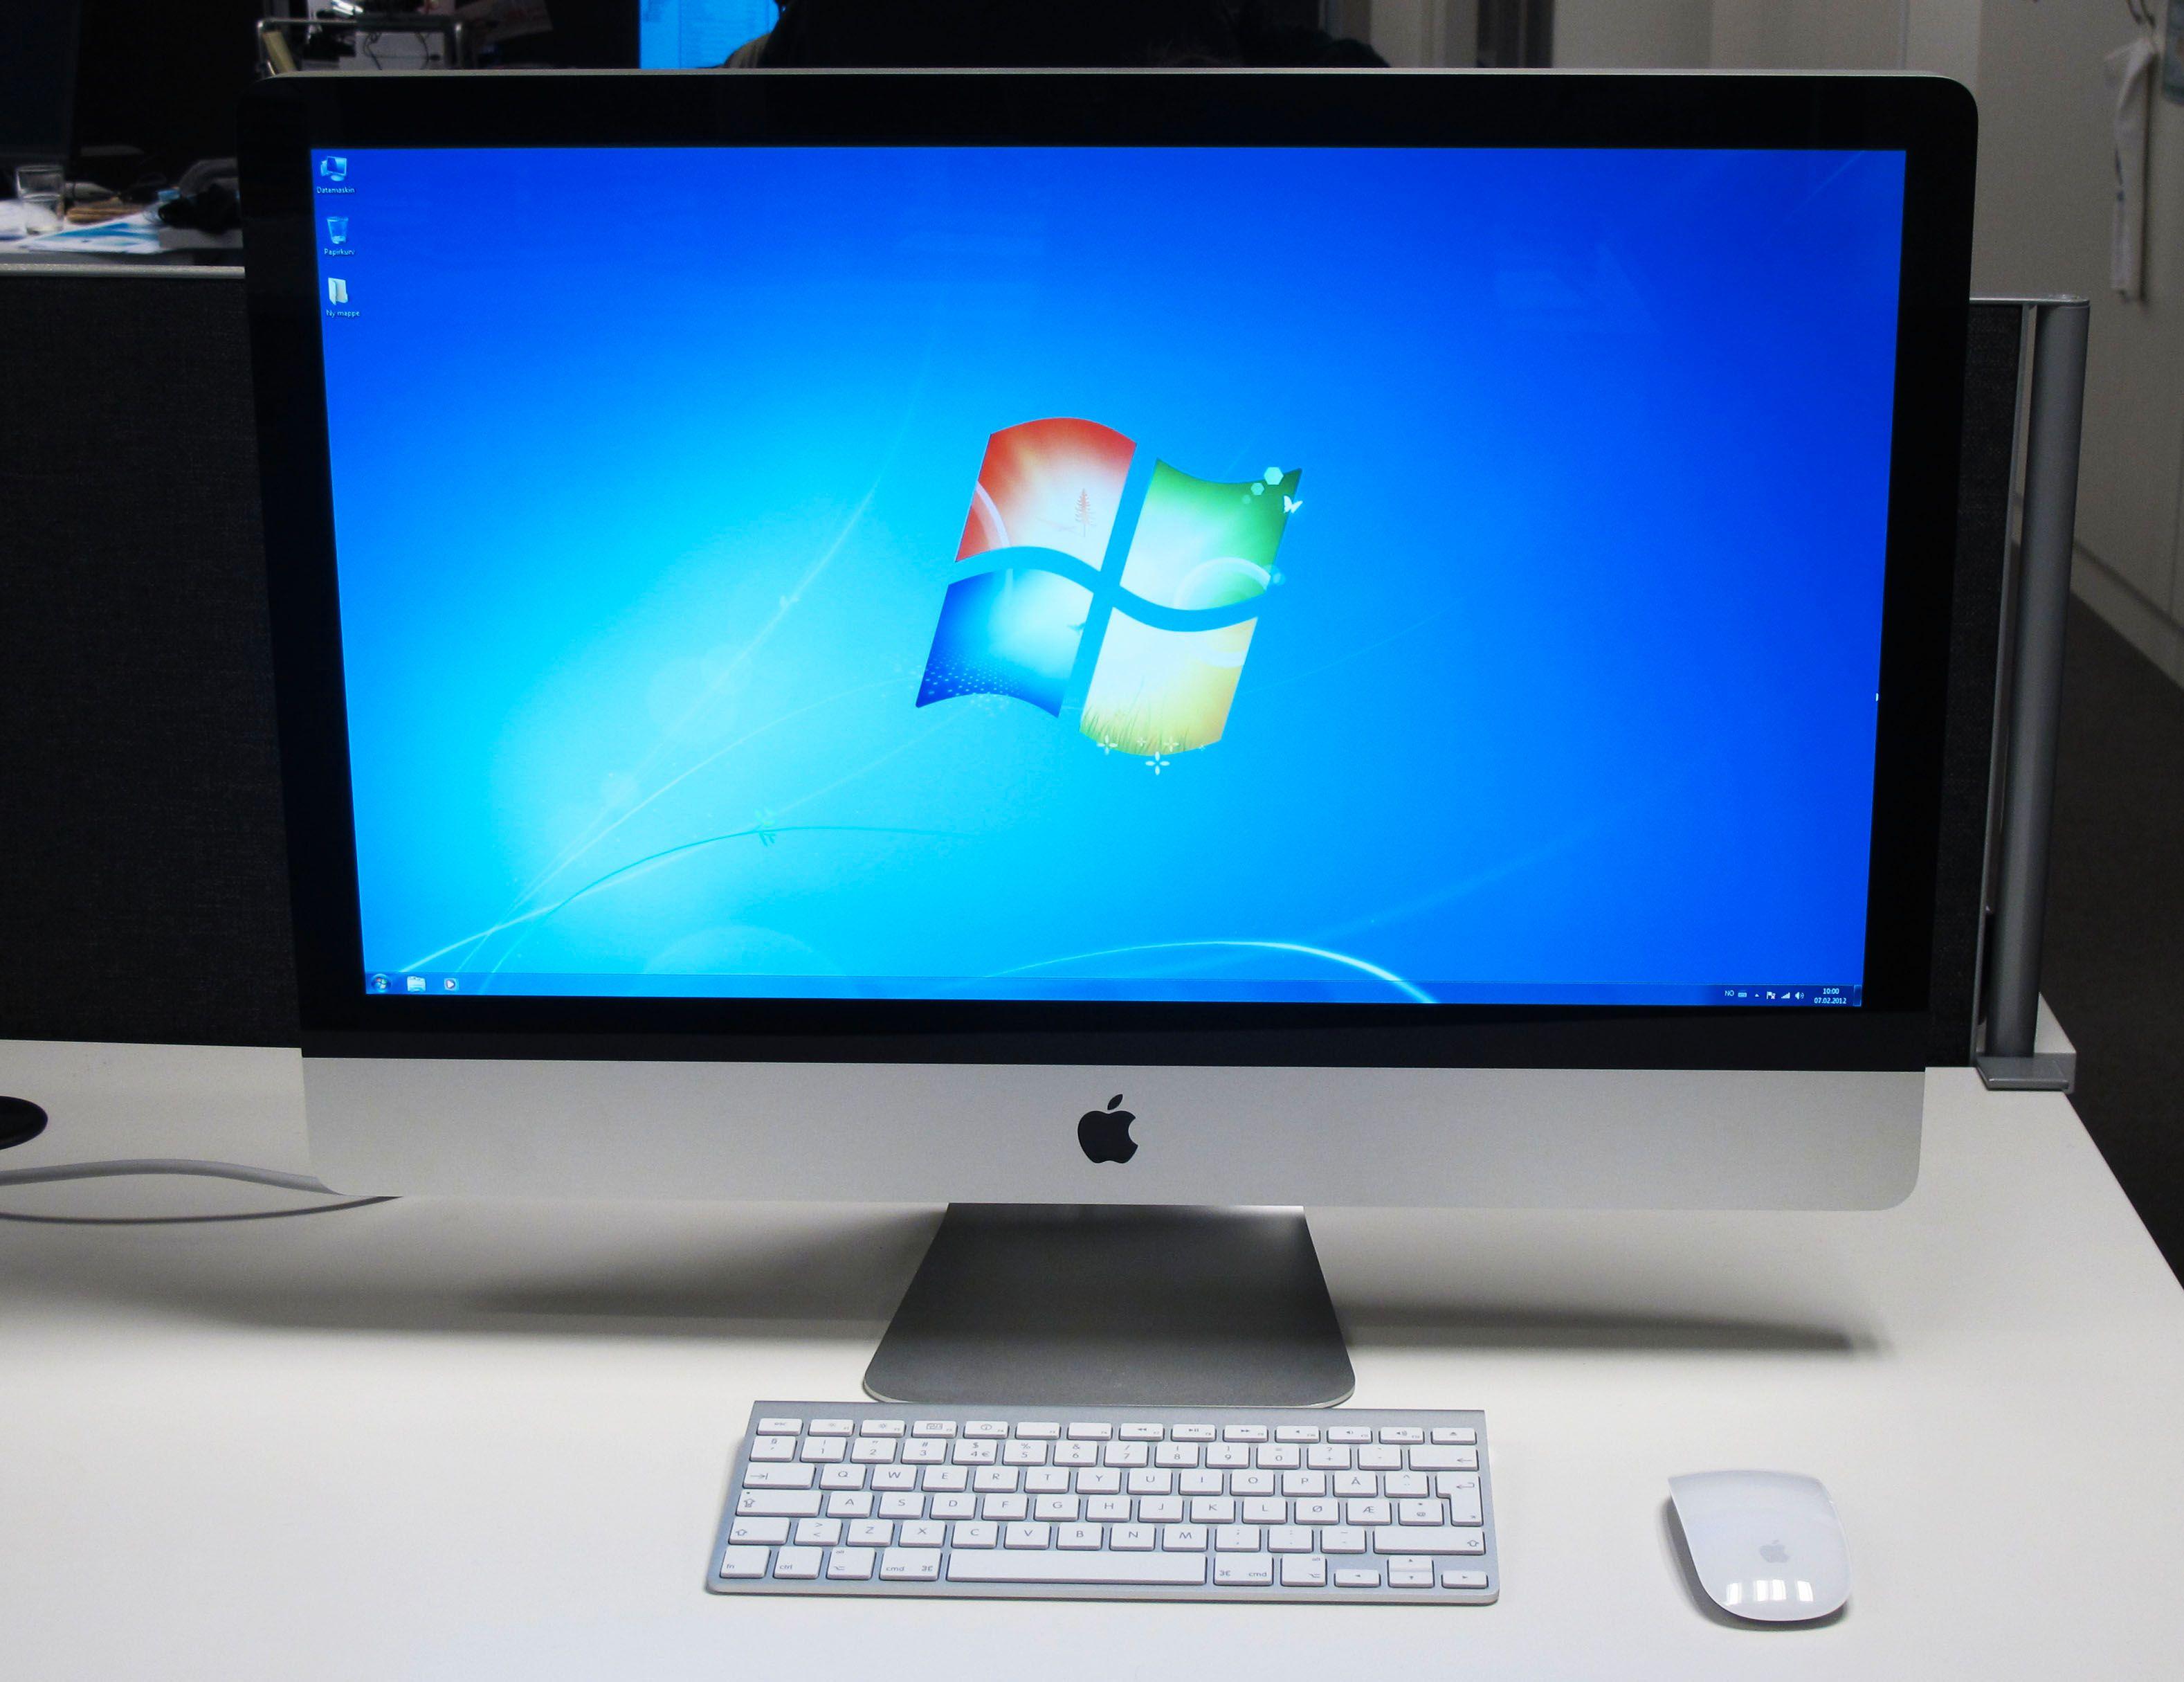 Mac med Windows. Helligbrøde, eller det beste fra to verdener?